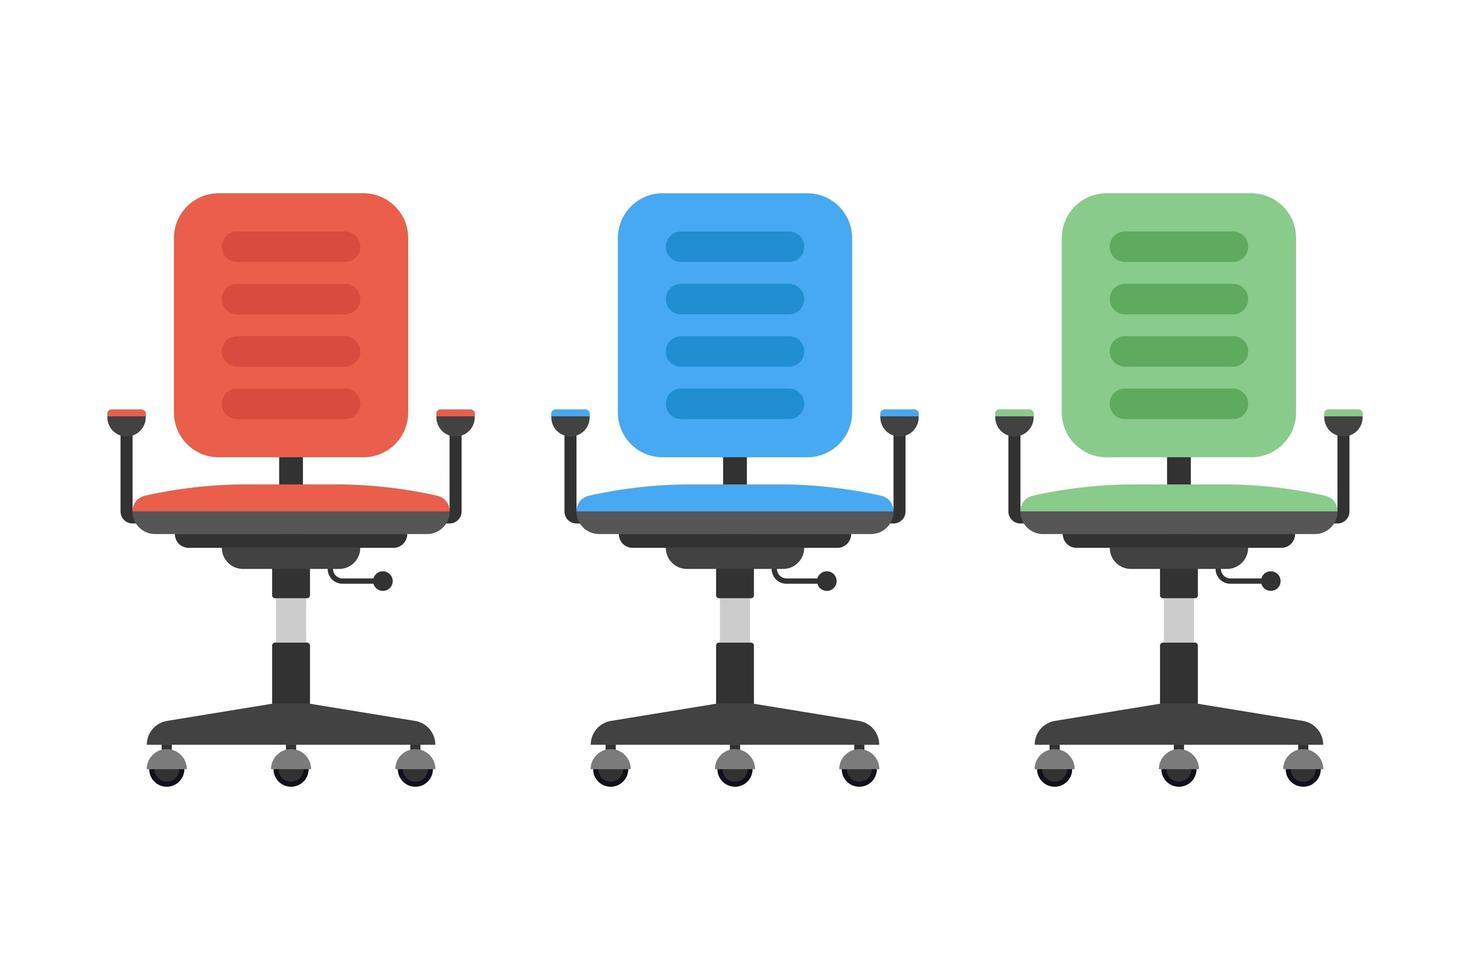 silla de oficina en diferentes colores vector